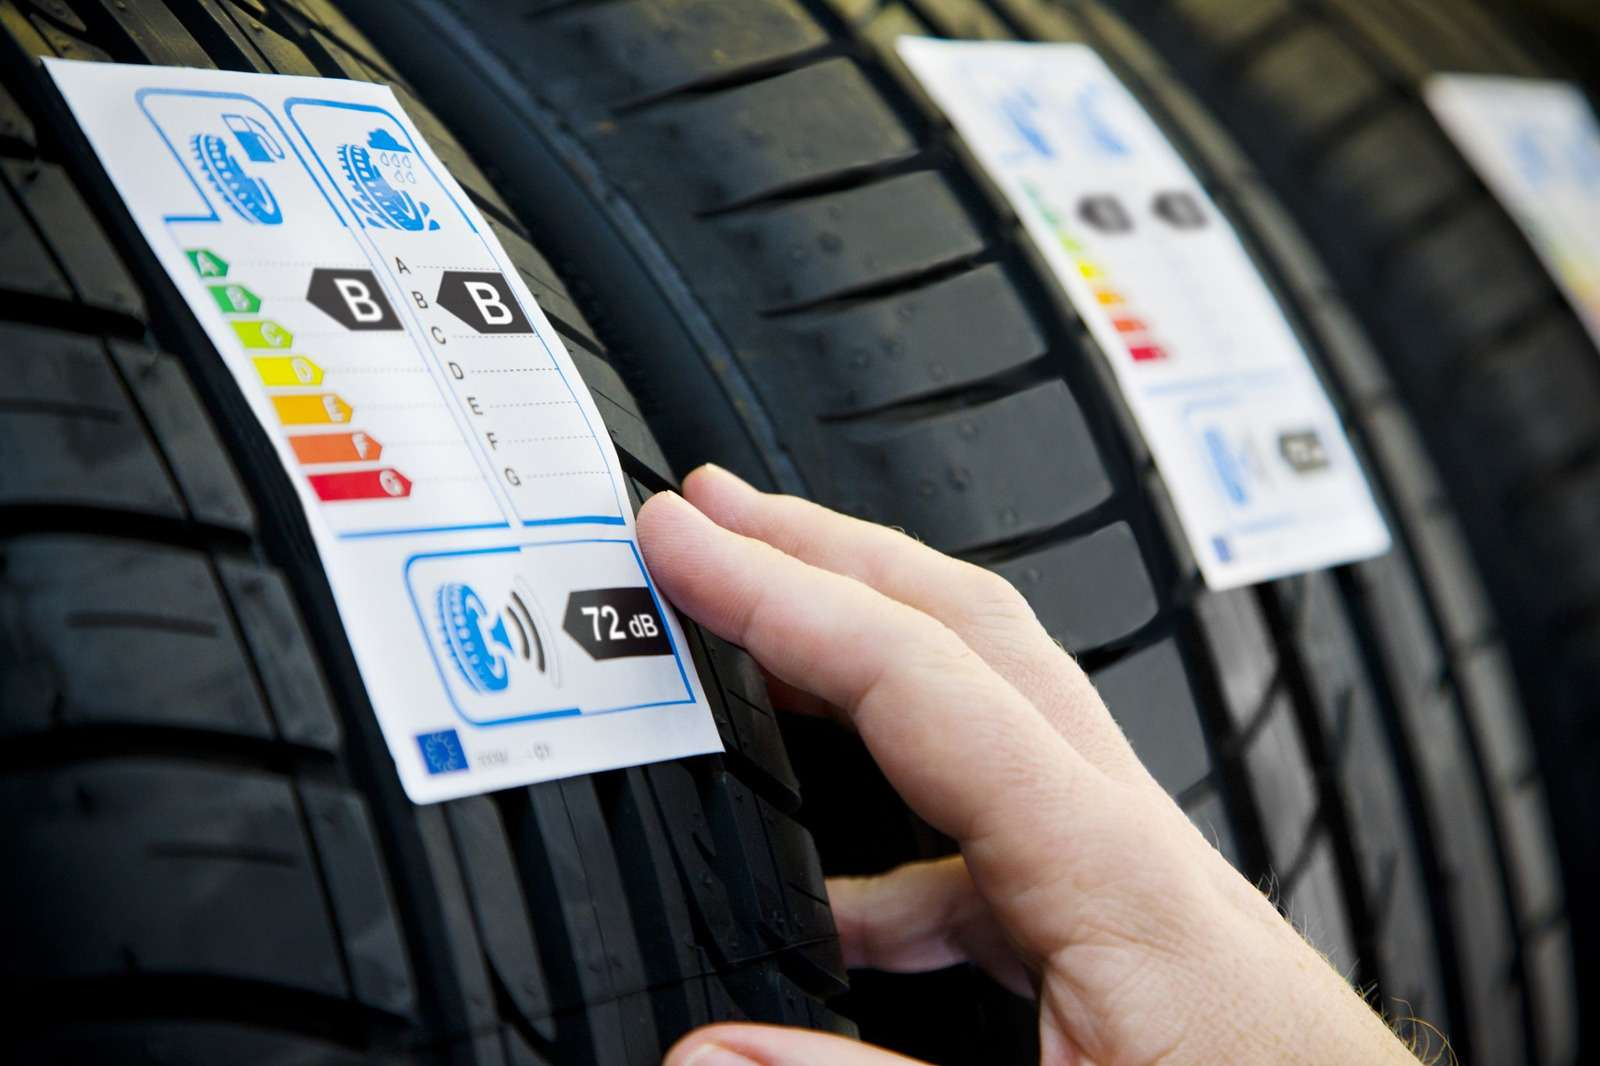 uploads-2014-03-20140319_no_copyright__gydu_close_up_of_generic_tire_label_in_dealership